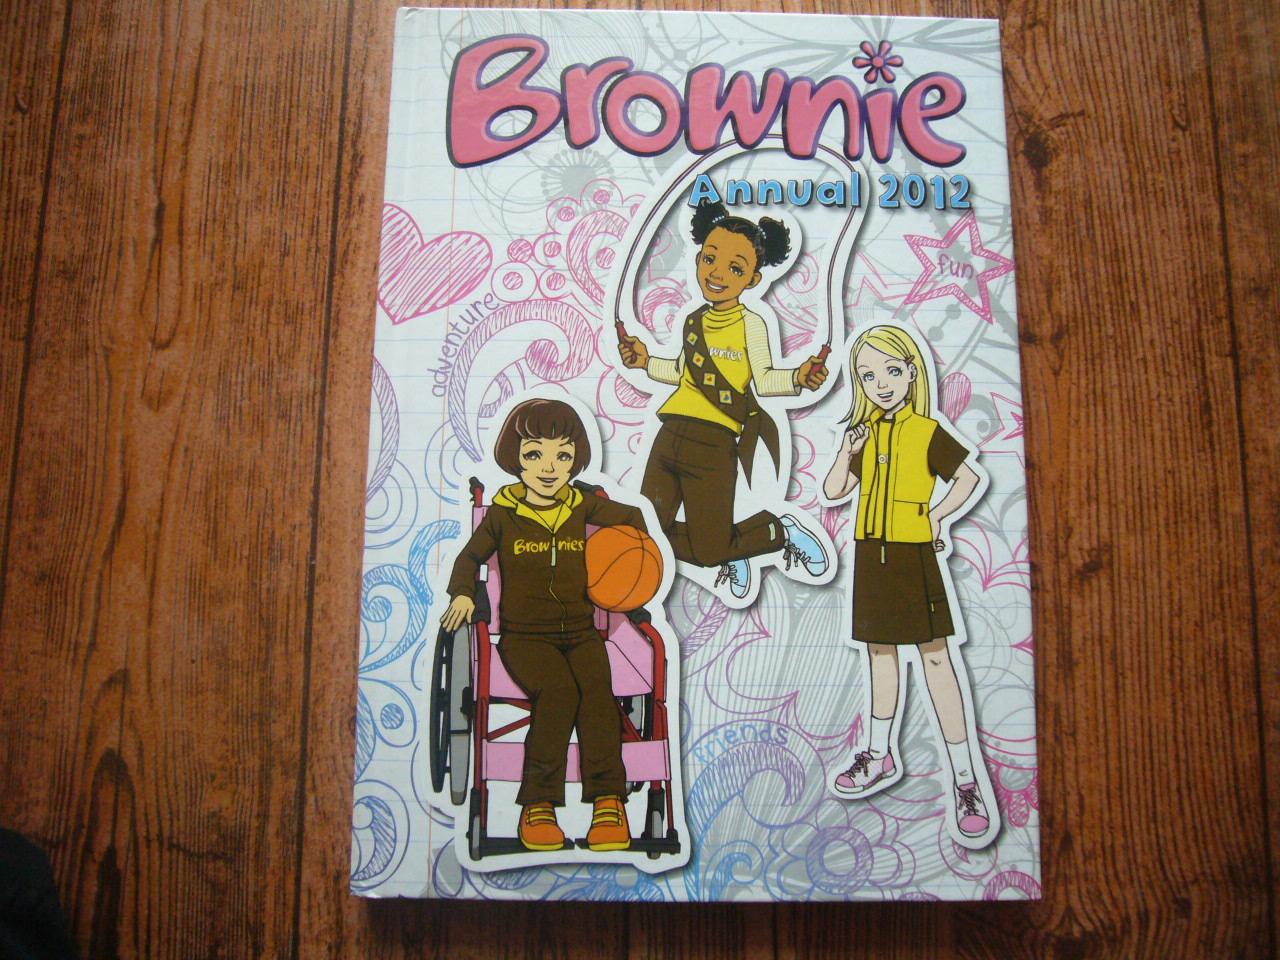 Brownie ANNUAL 2012